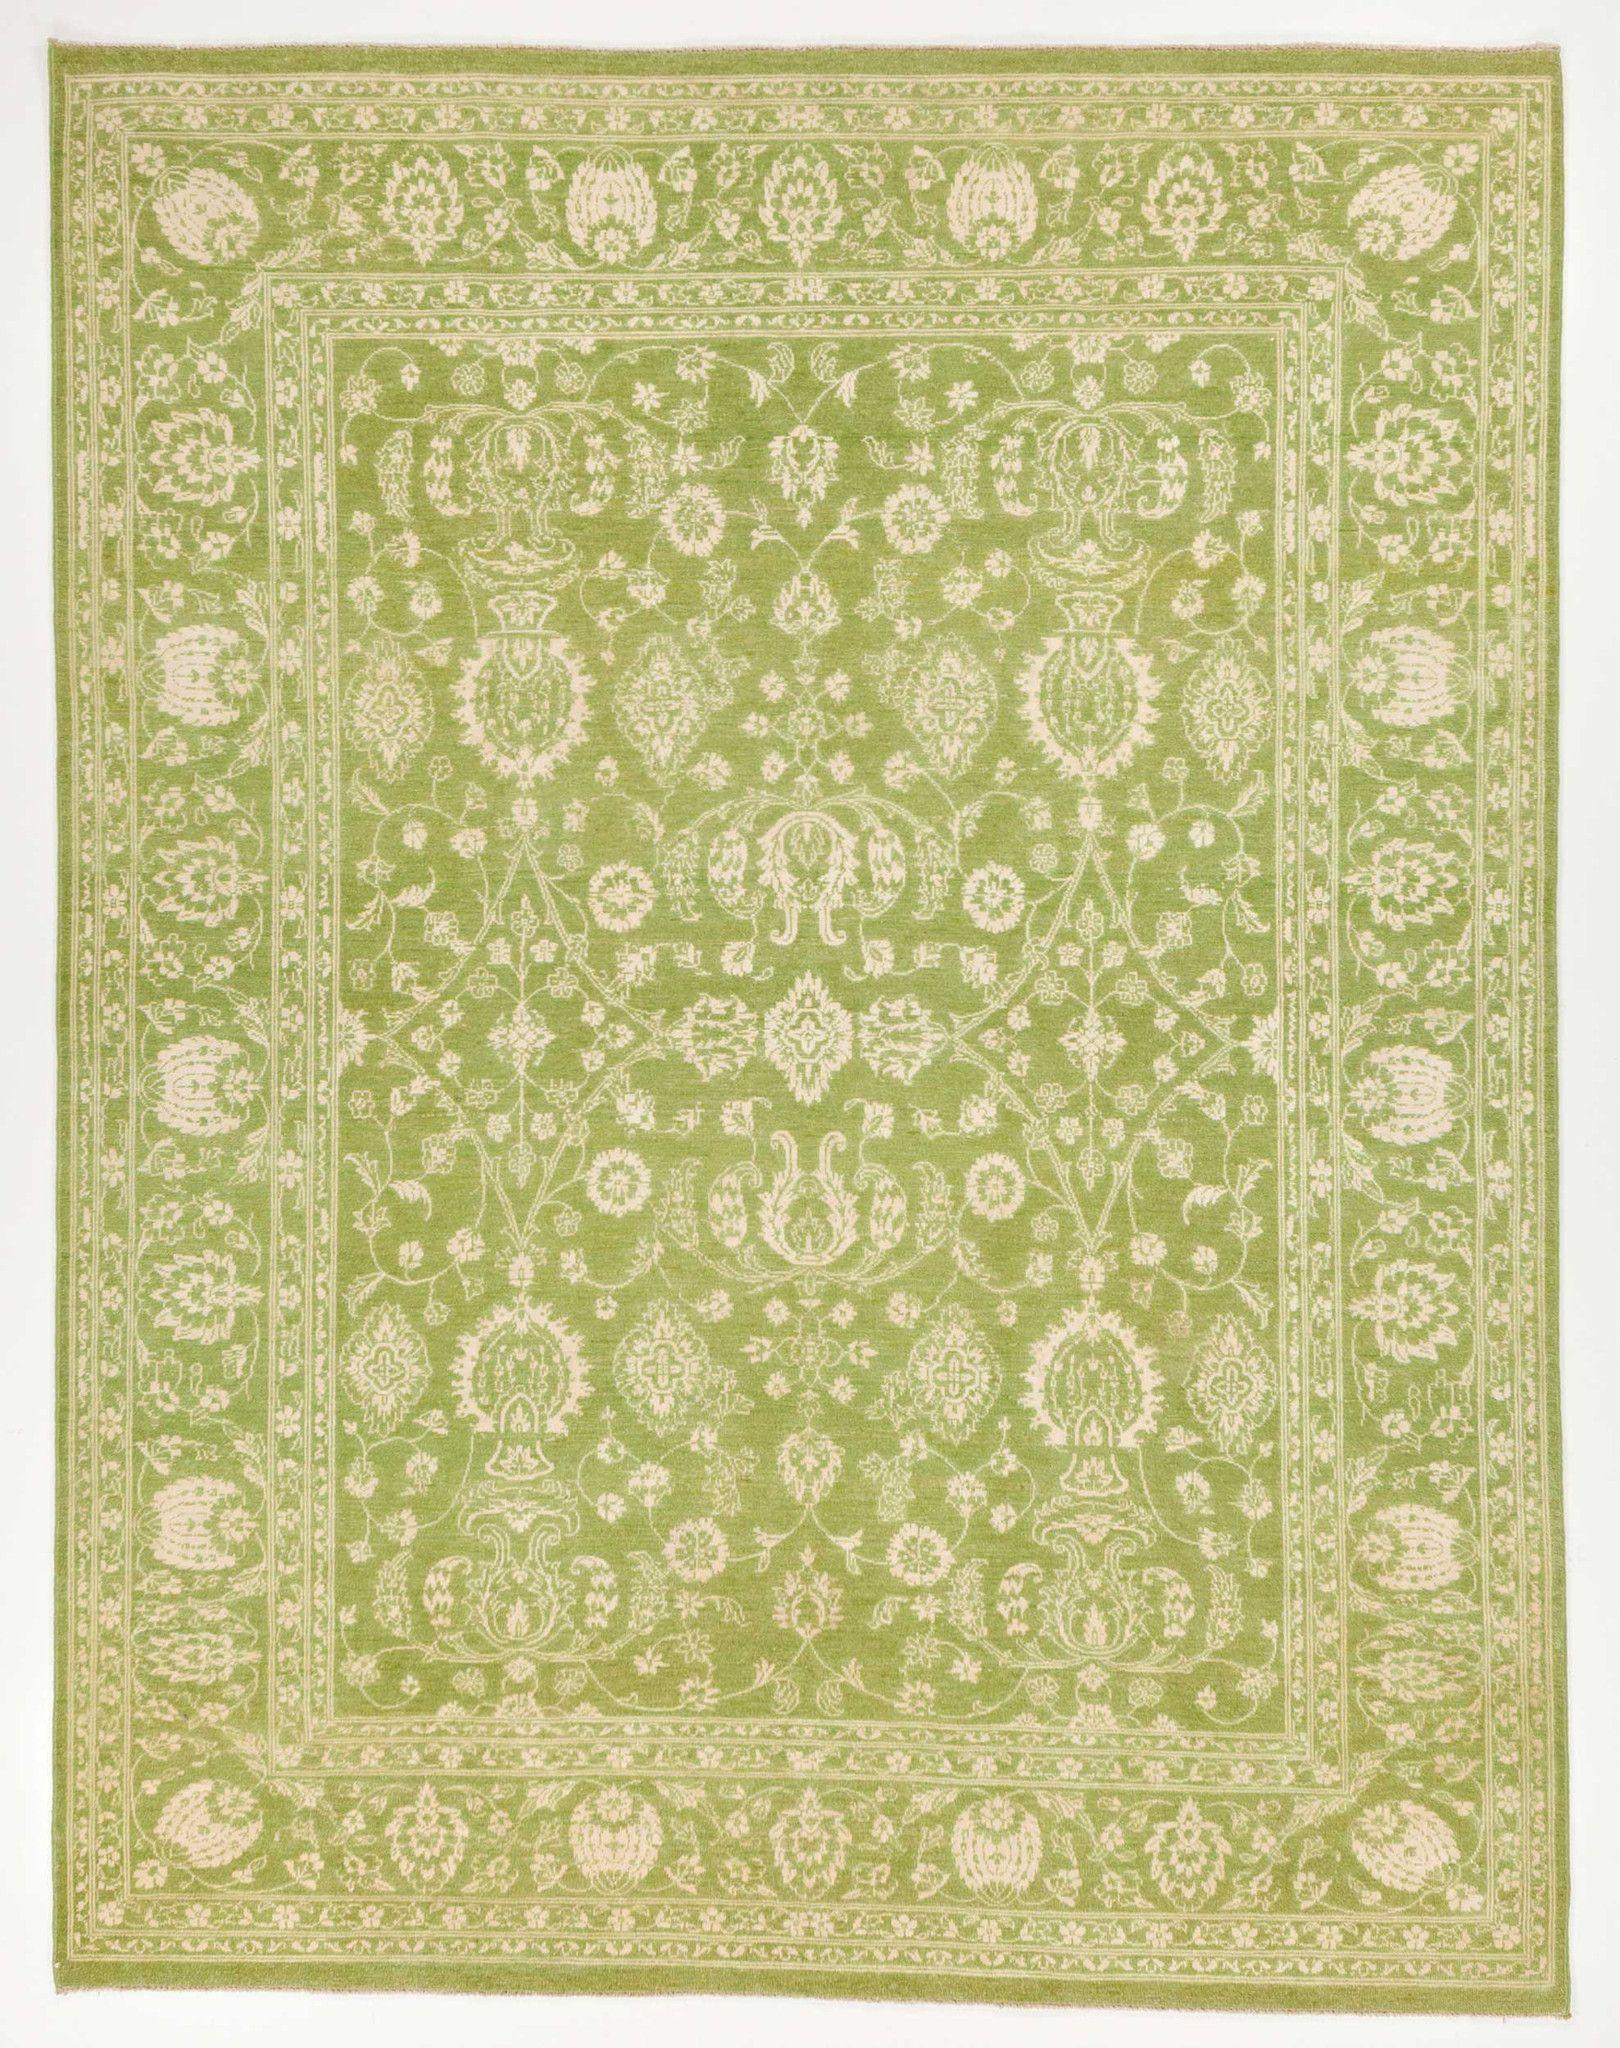 8 0 X 10 4 Light Lime Green Ivory Wool Silk Rug Classic Rugs